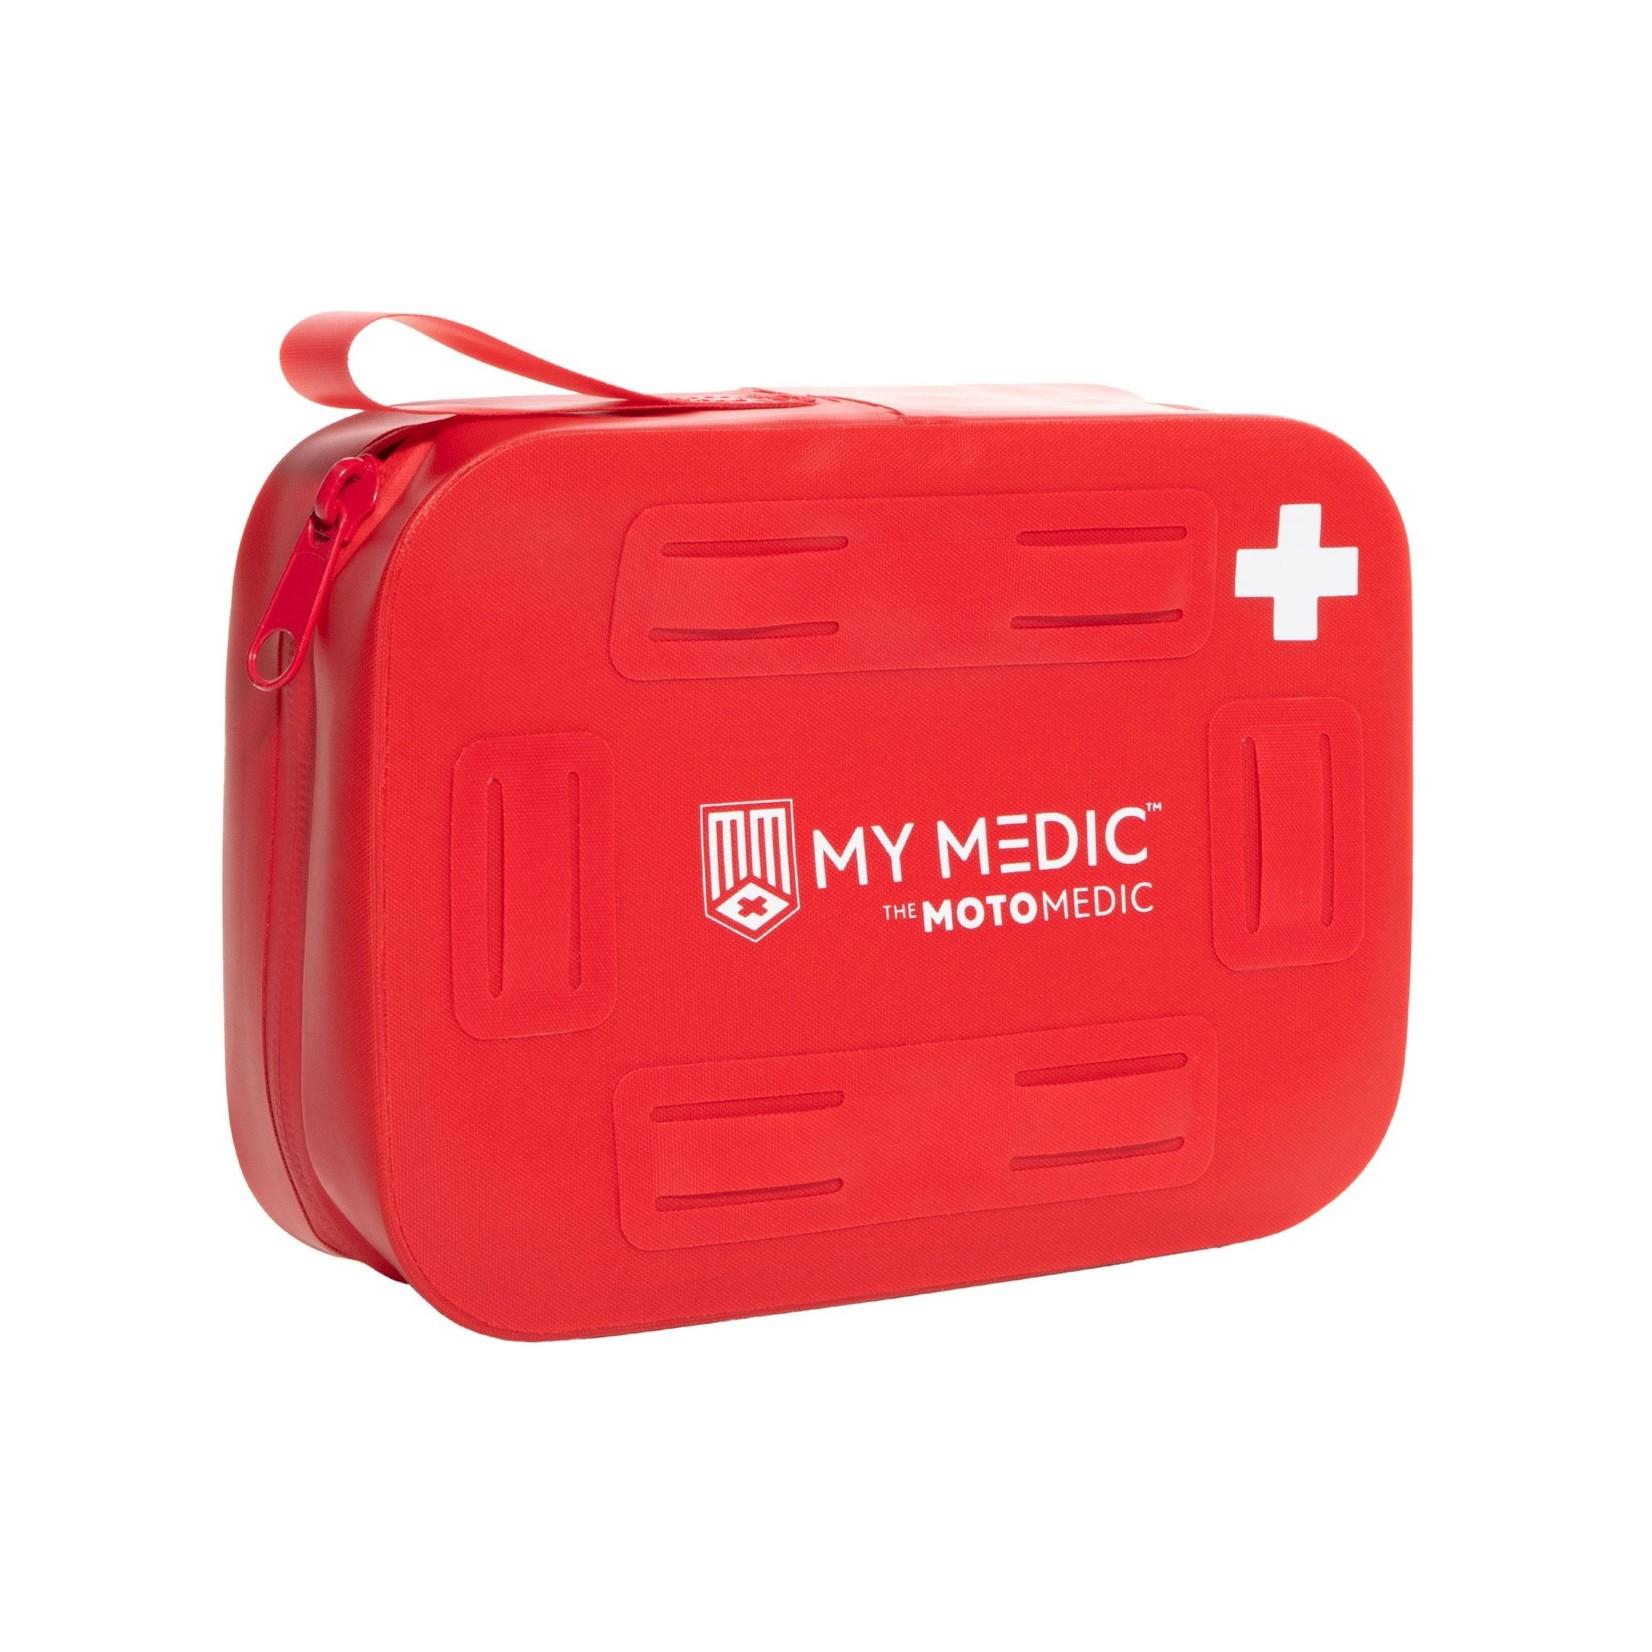 MyMedic Moto Medic Stormproof First Aid Kit